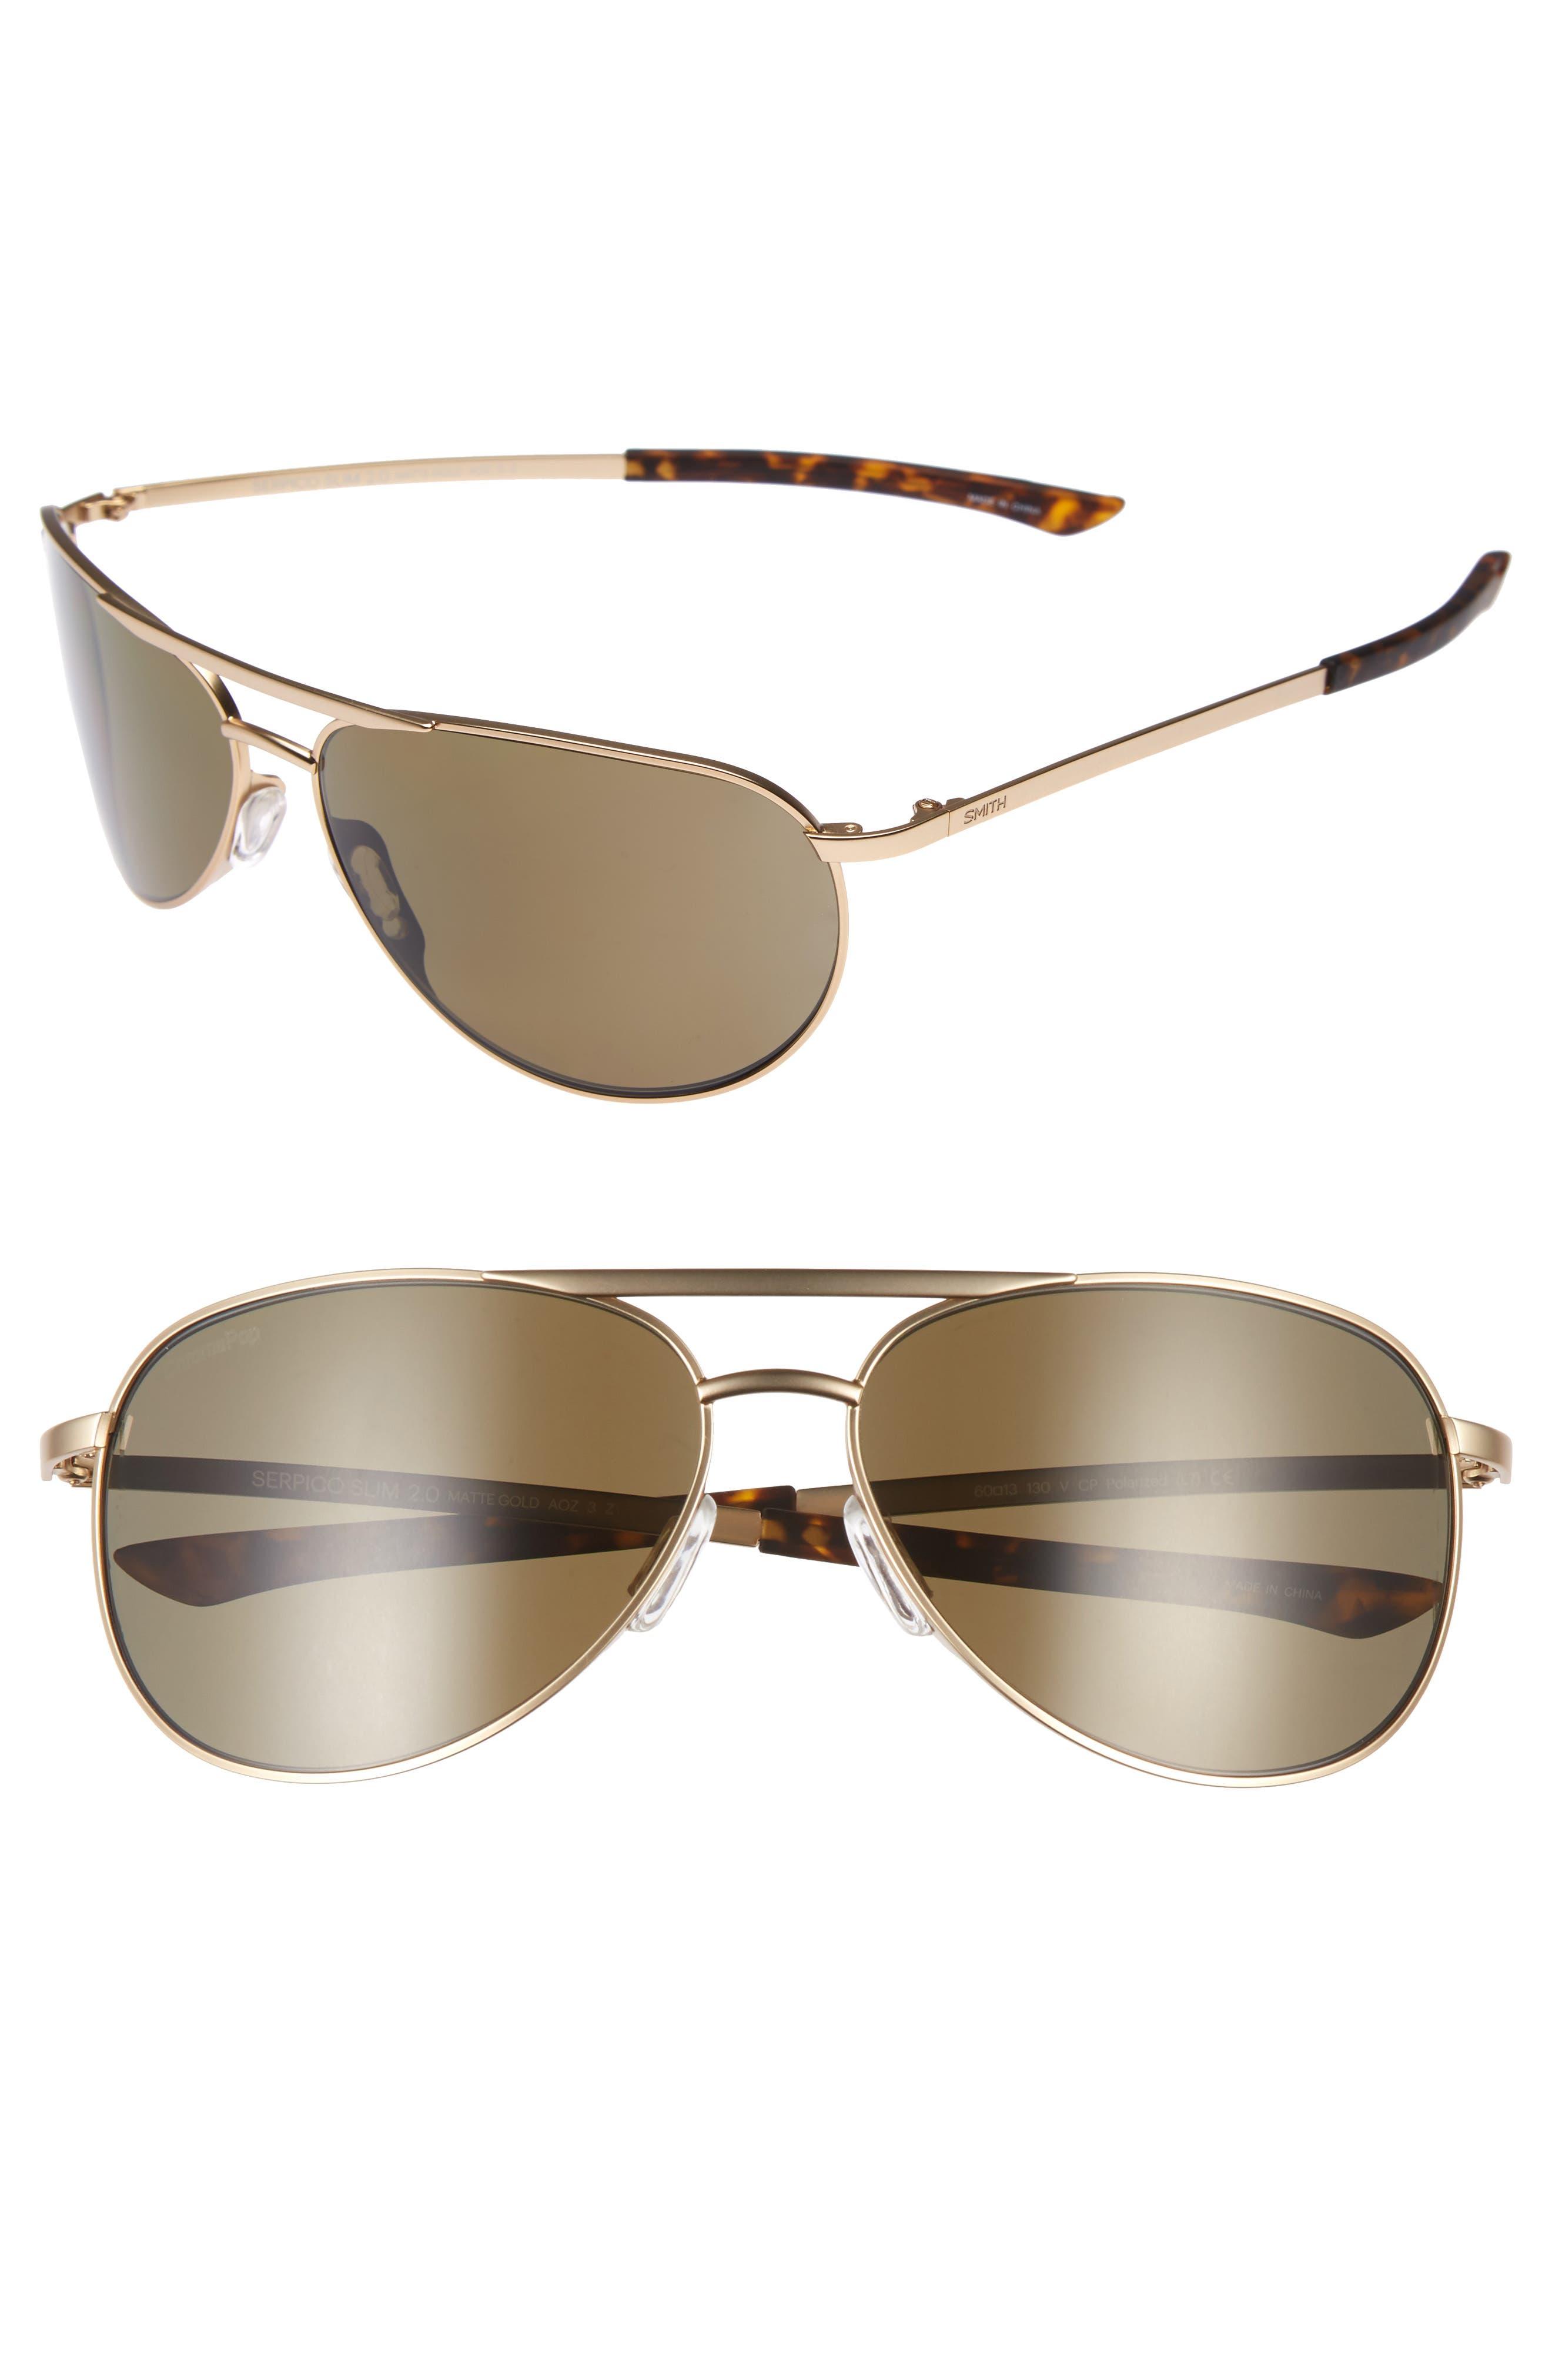 Serpico Slim 2.0 60mm ChromaPop Polarized Aviator Sunglasses,                         Main,                         color, Gold/ Brown Polar